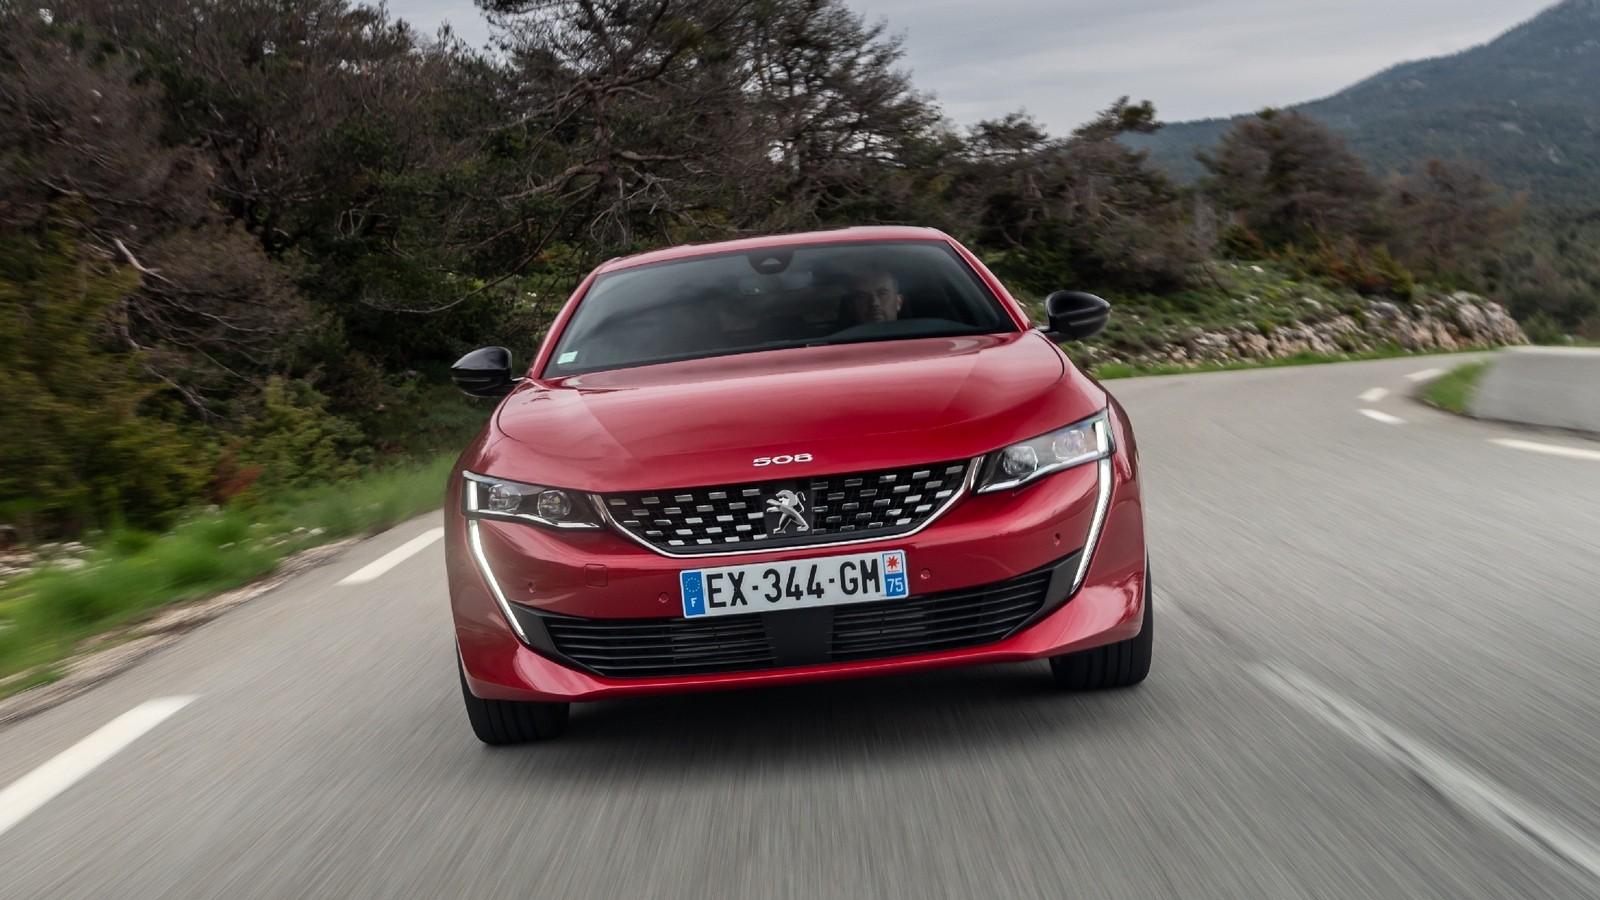 Peugeot 508 красная на трассе спереди